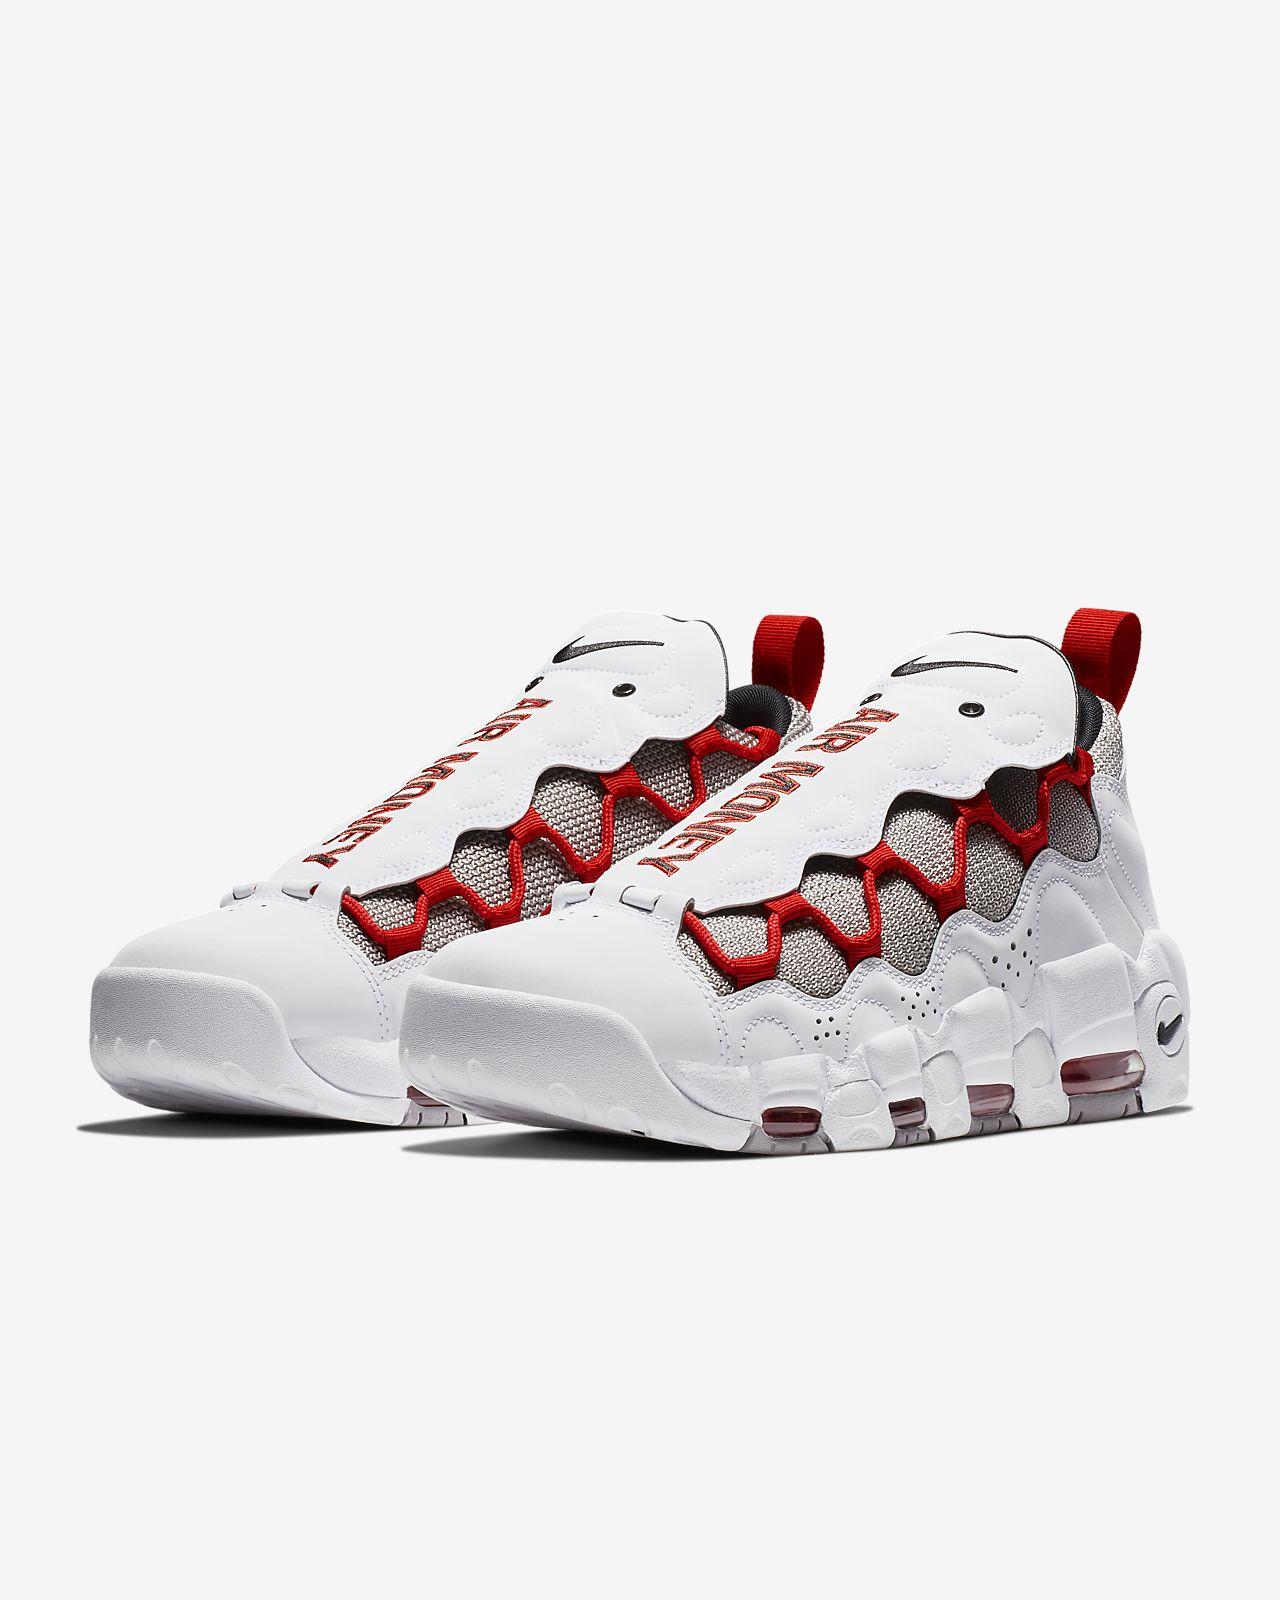 huge selection of 47610 21eb5 ... Nike Air More Money Men s Shoe